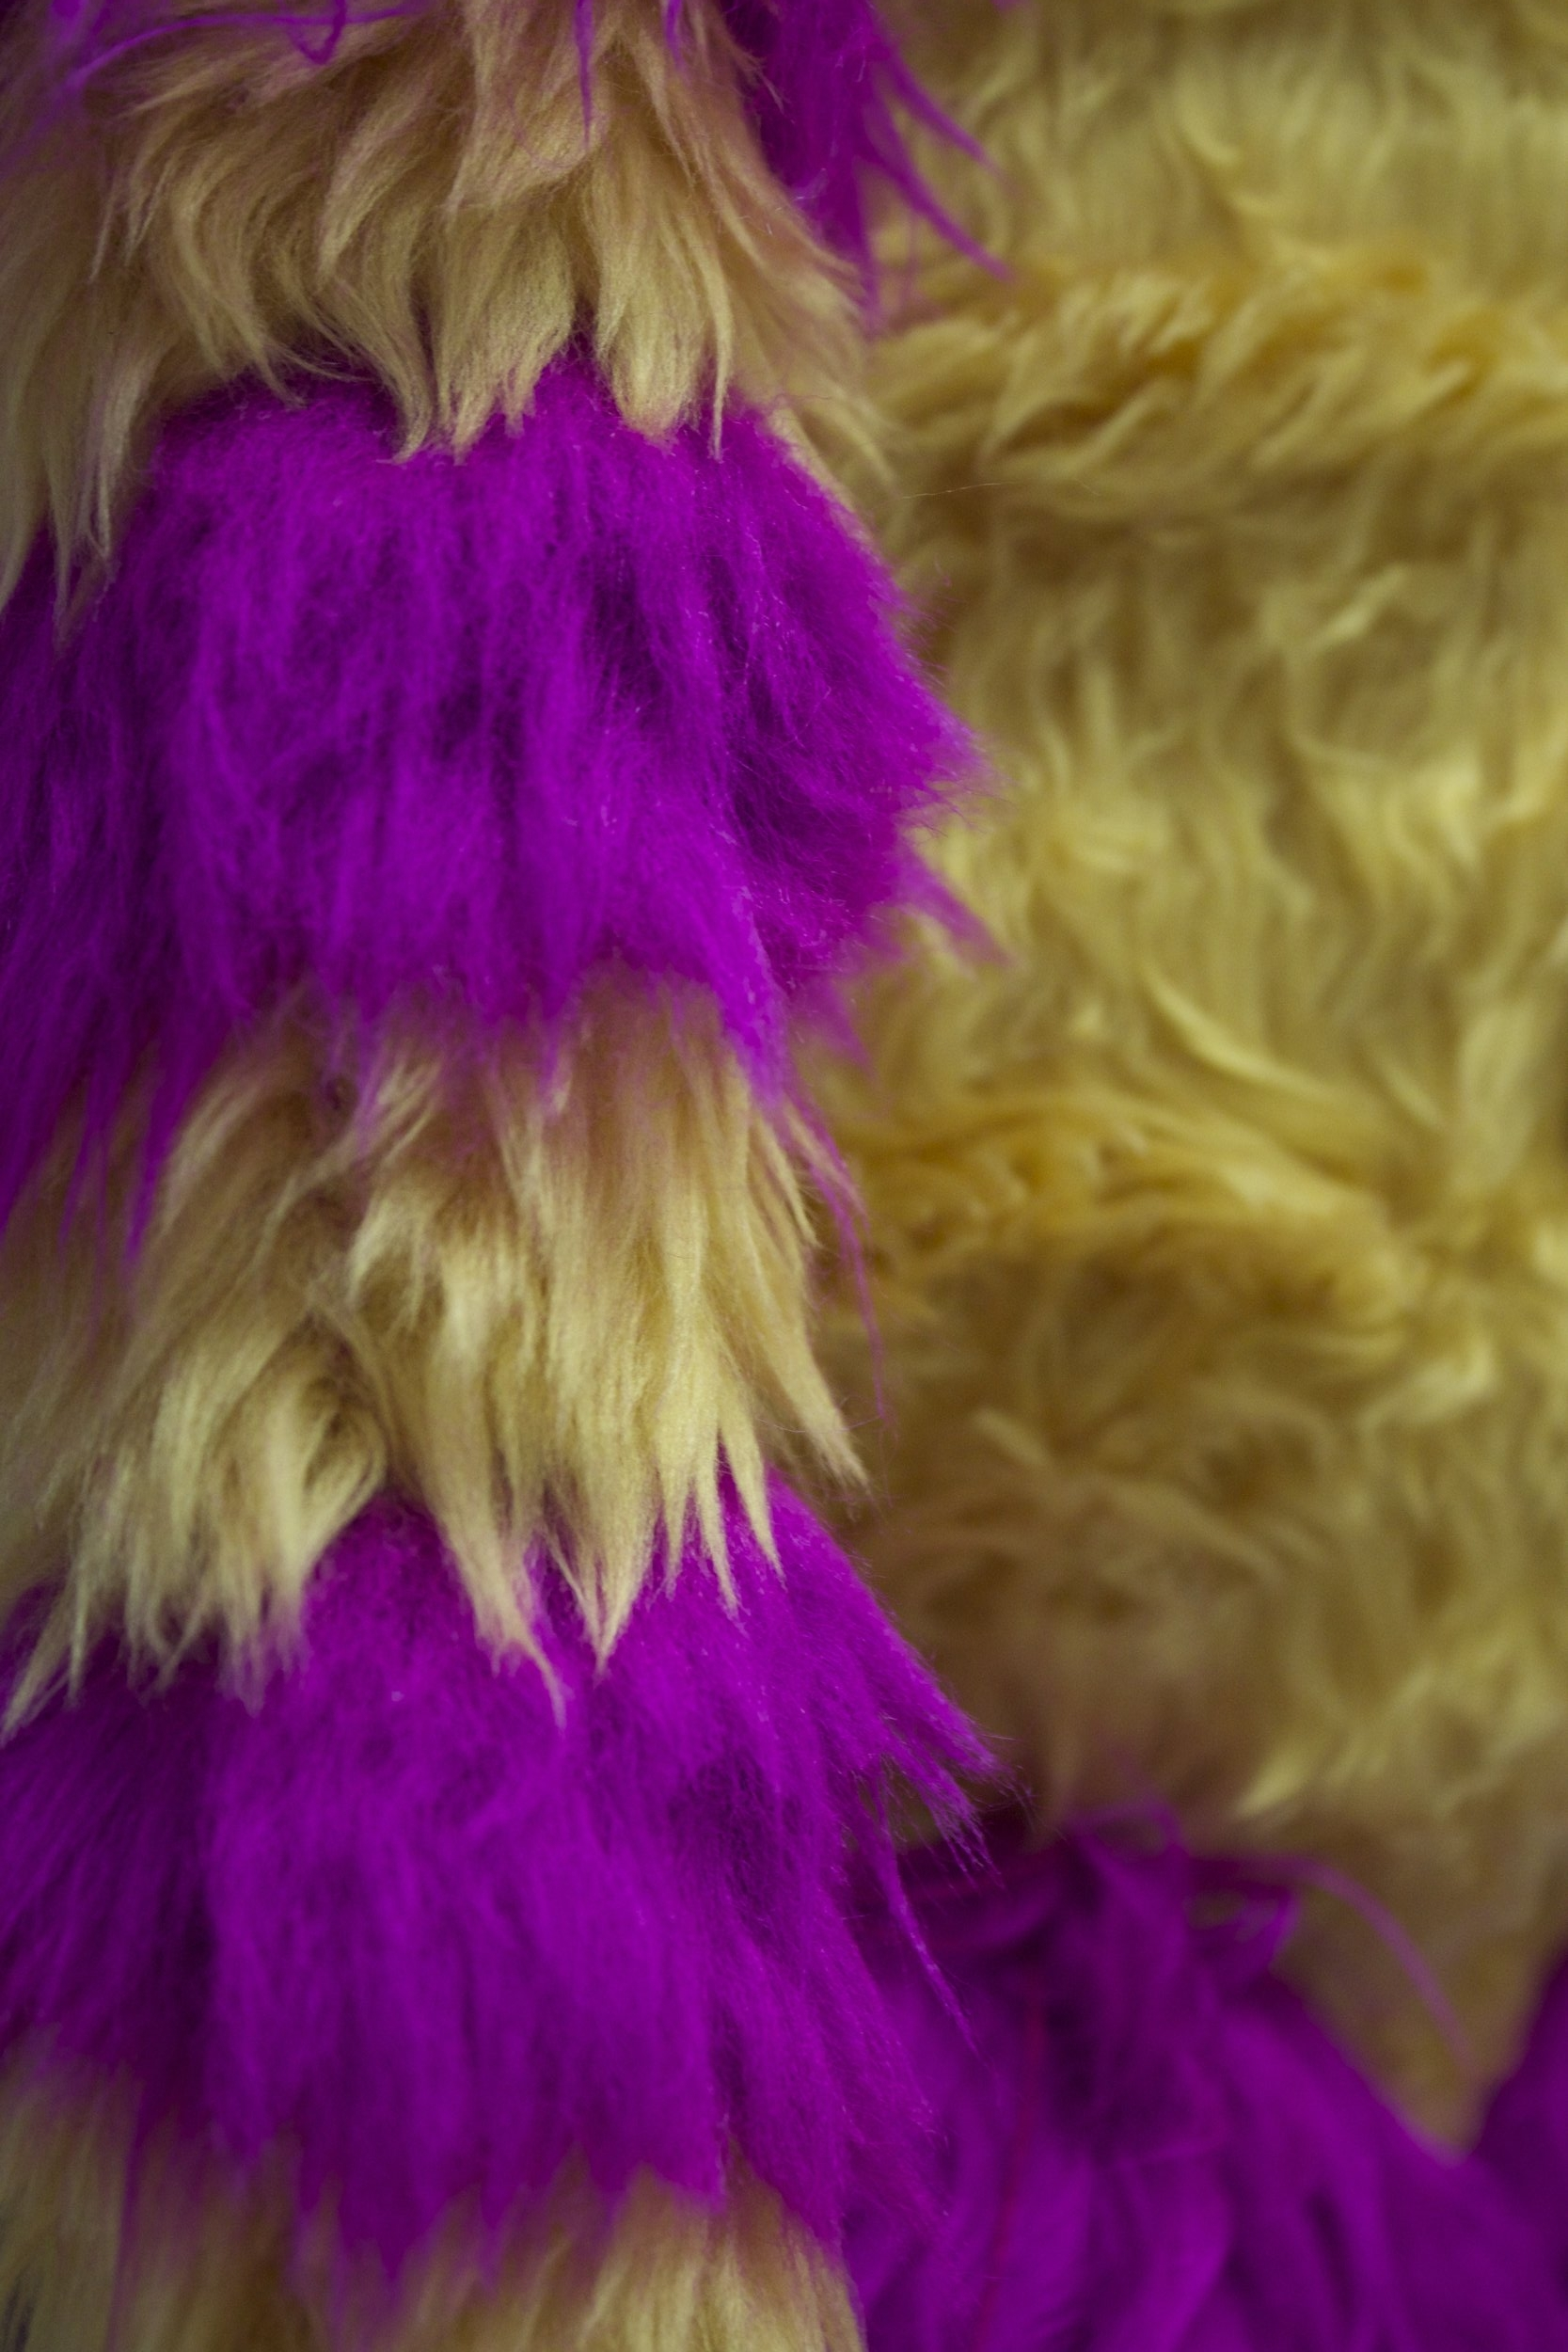 Furring Process